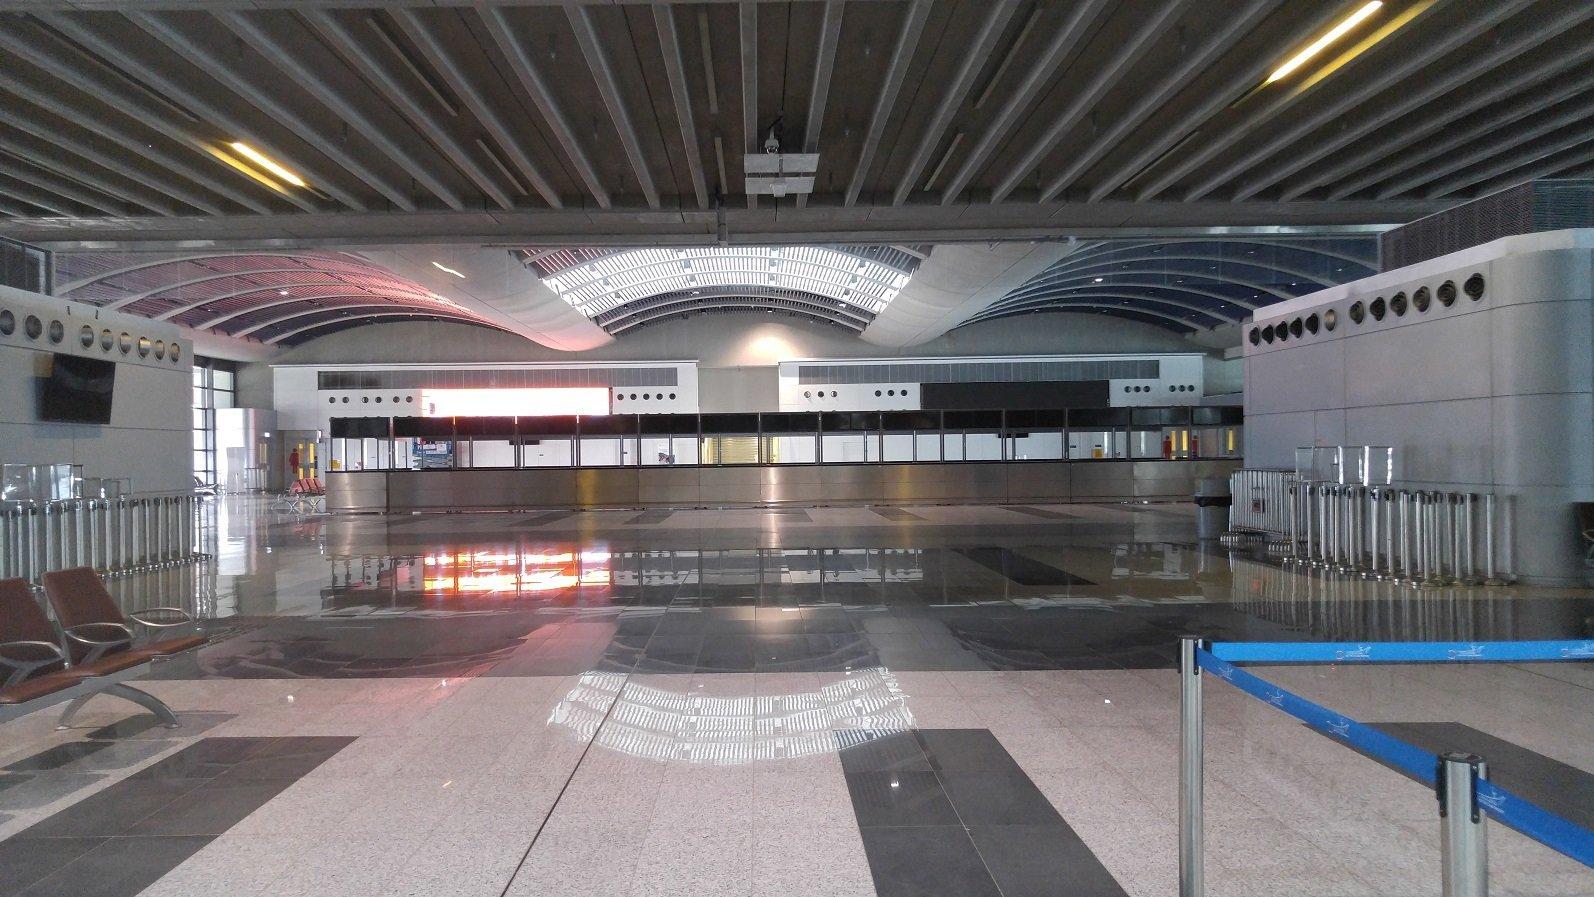 Kai Tak Cruise Terminal Waiting Hall A